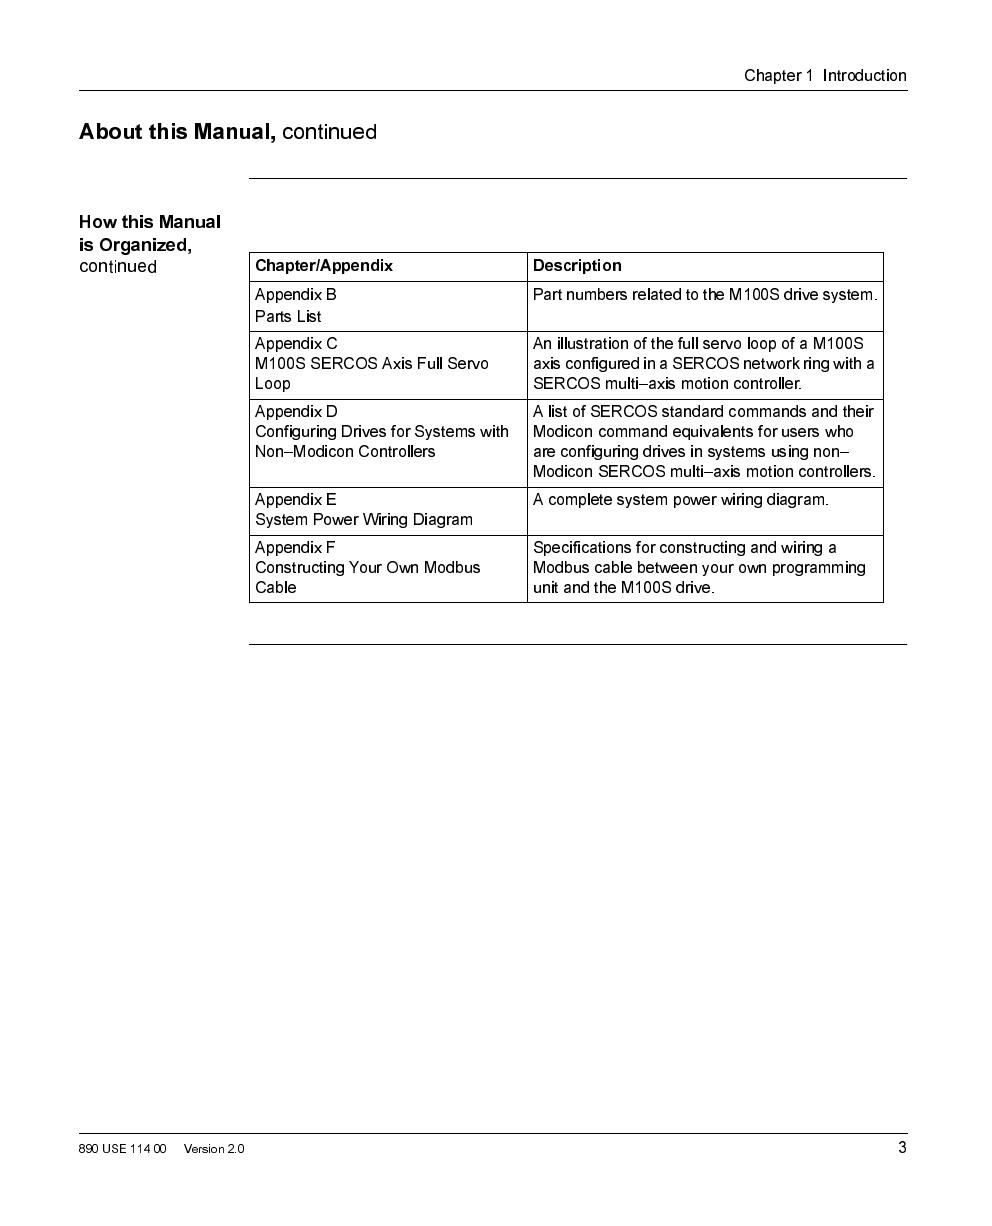 112389 Catalog Modbus Wiring Specification